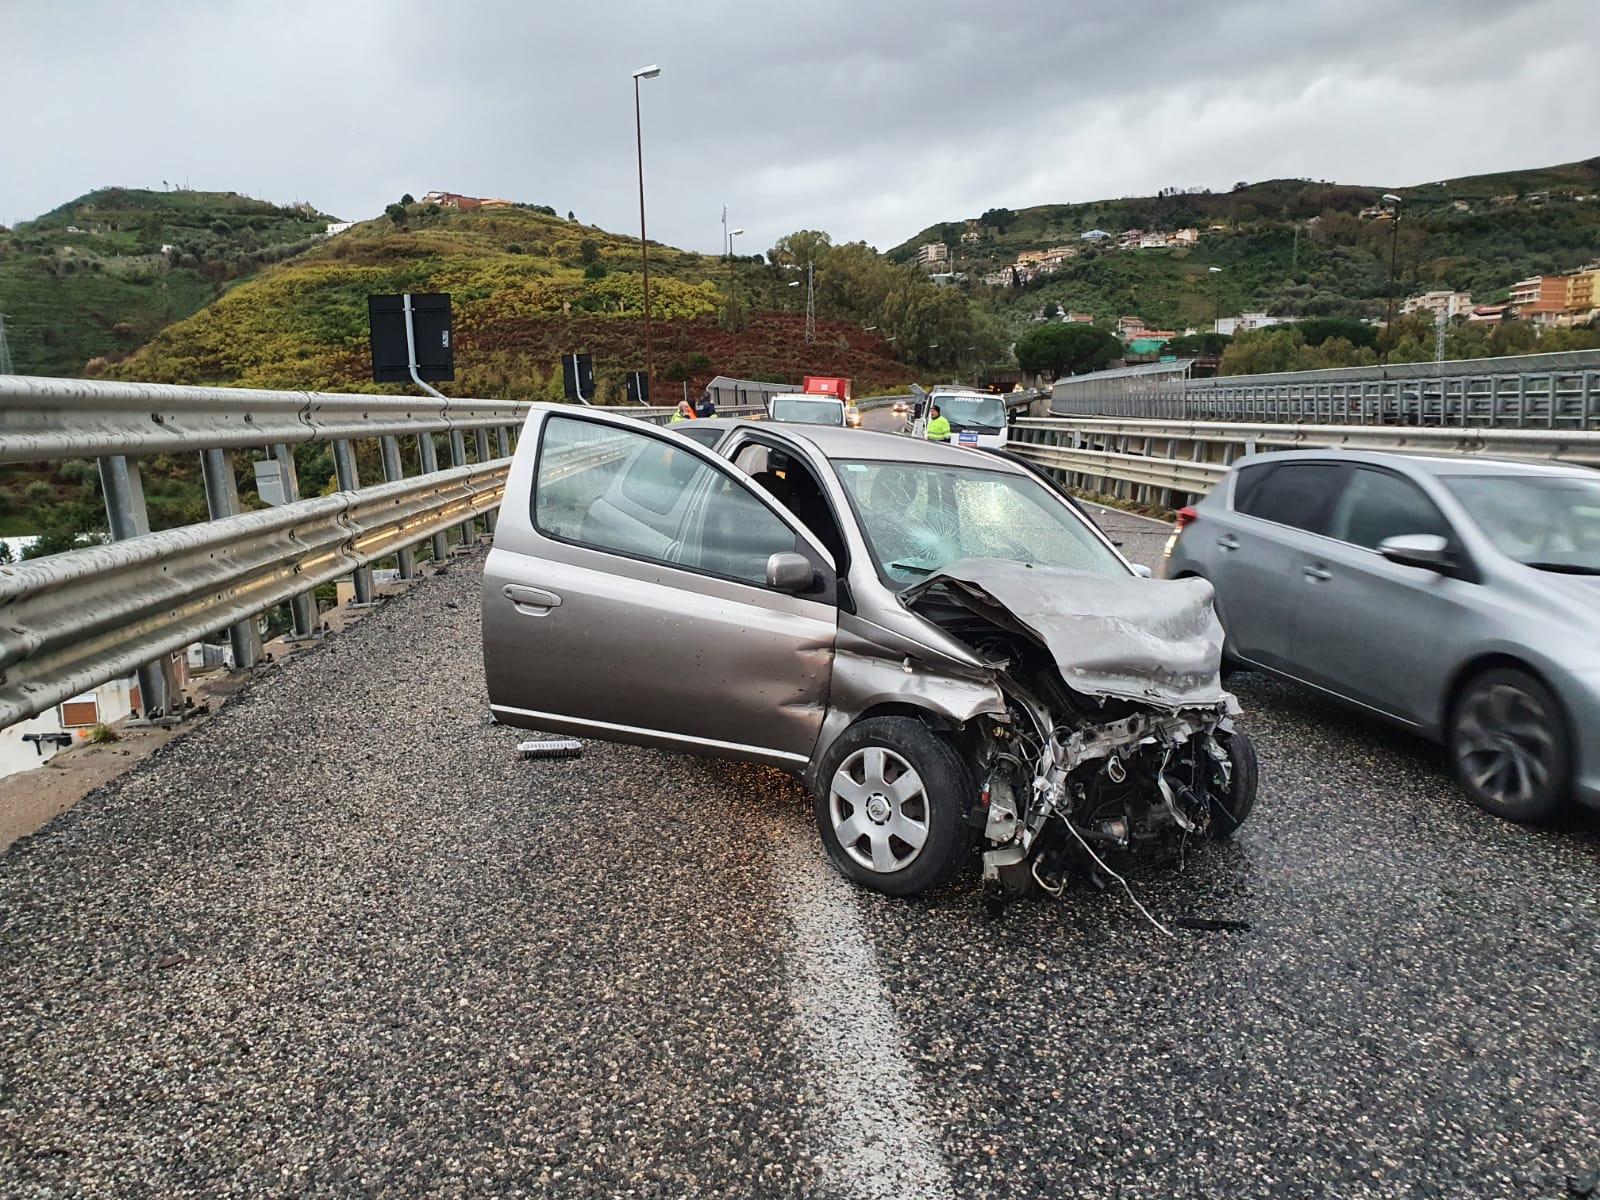 Incidente in Tangenziale, automobilista rischia di perdere un piede